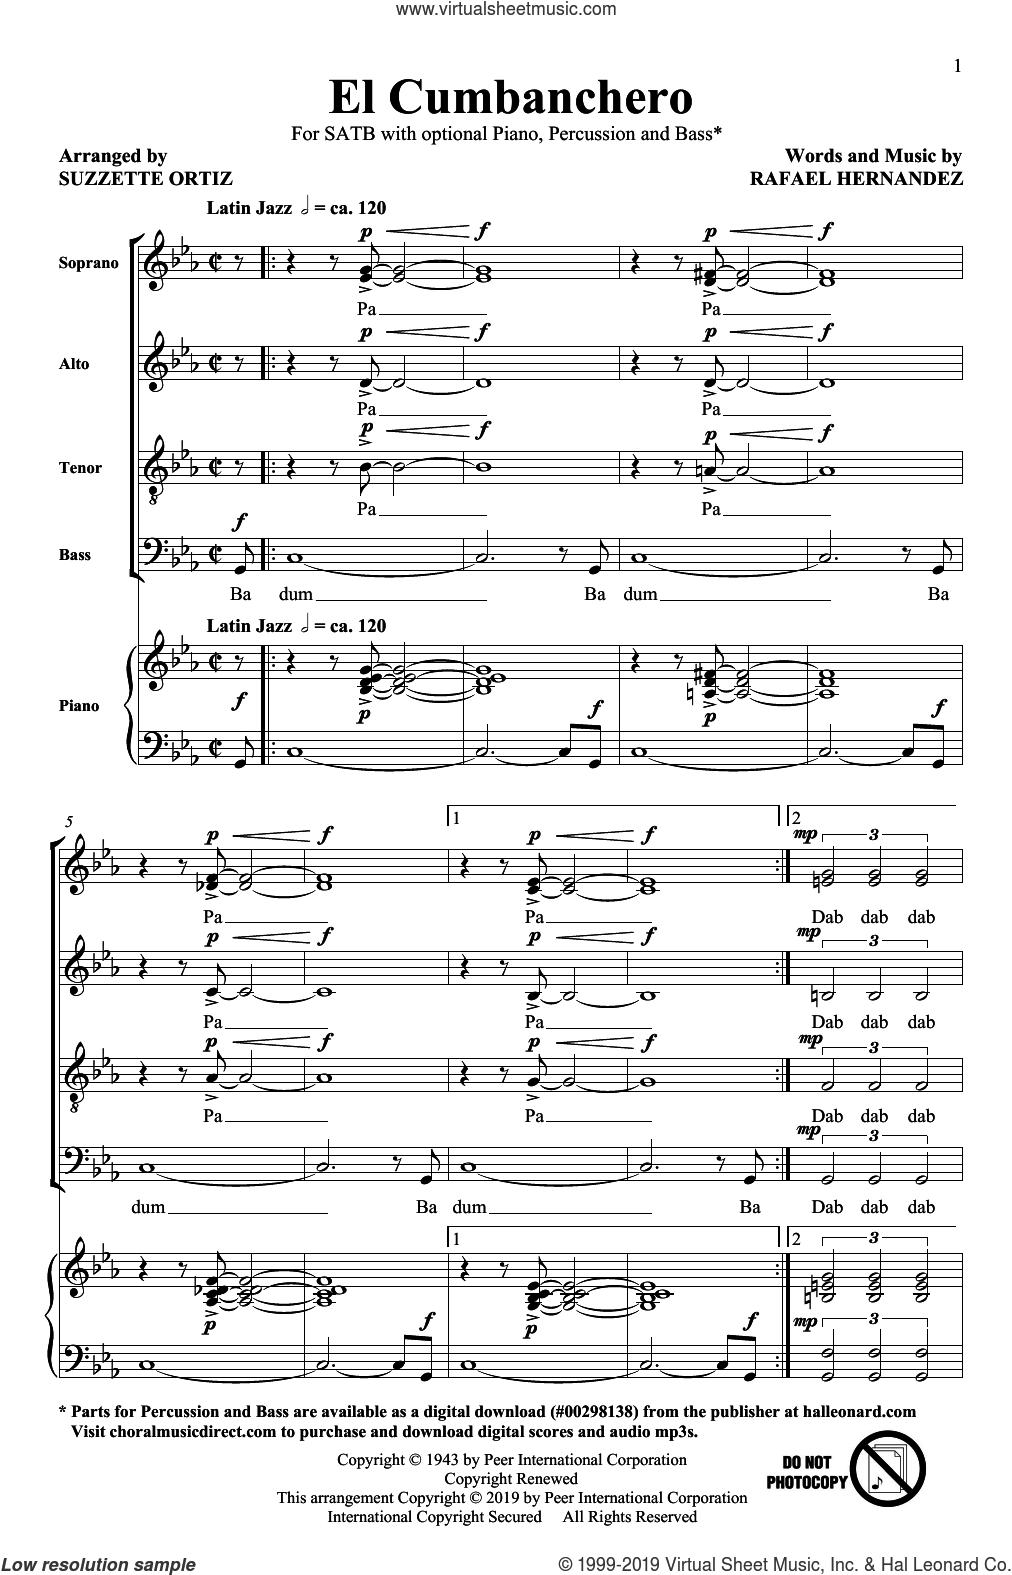 El Cumbanchero (arr. Suzette Ortiz) sheet music for choir (SATB: soprano, alto, tenor, bass) by Rafael Hernandez and Suzzette Ortiz, intermediate skill level